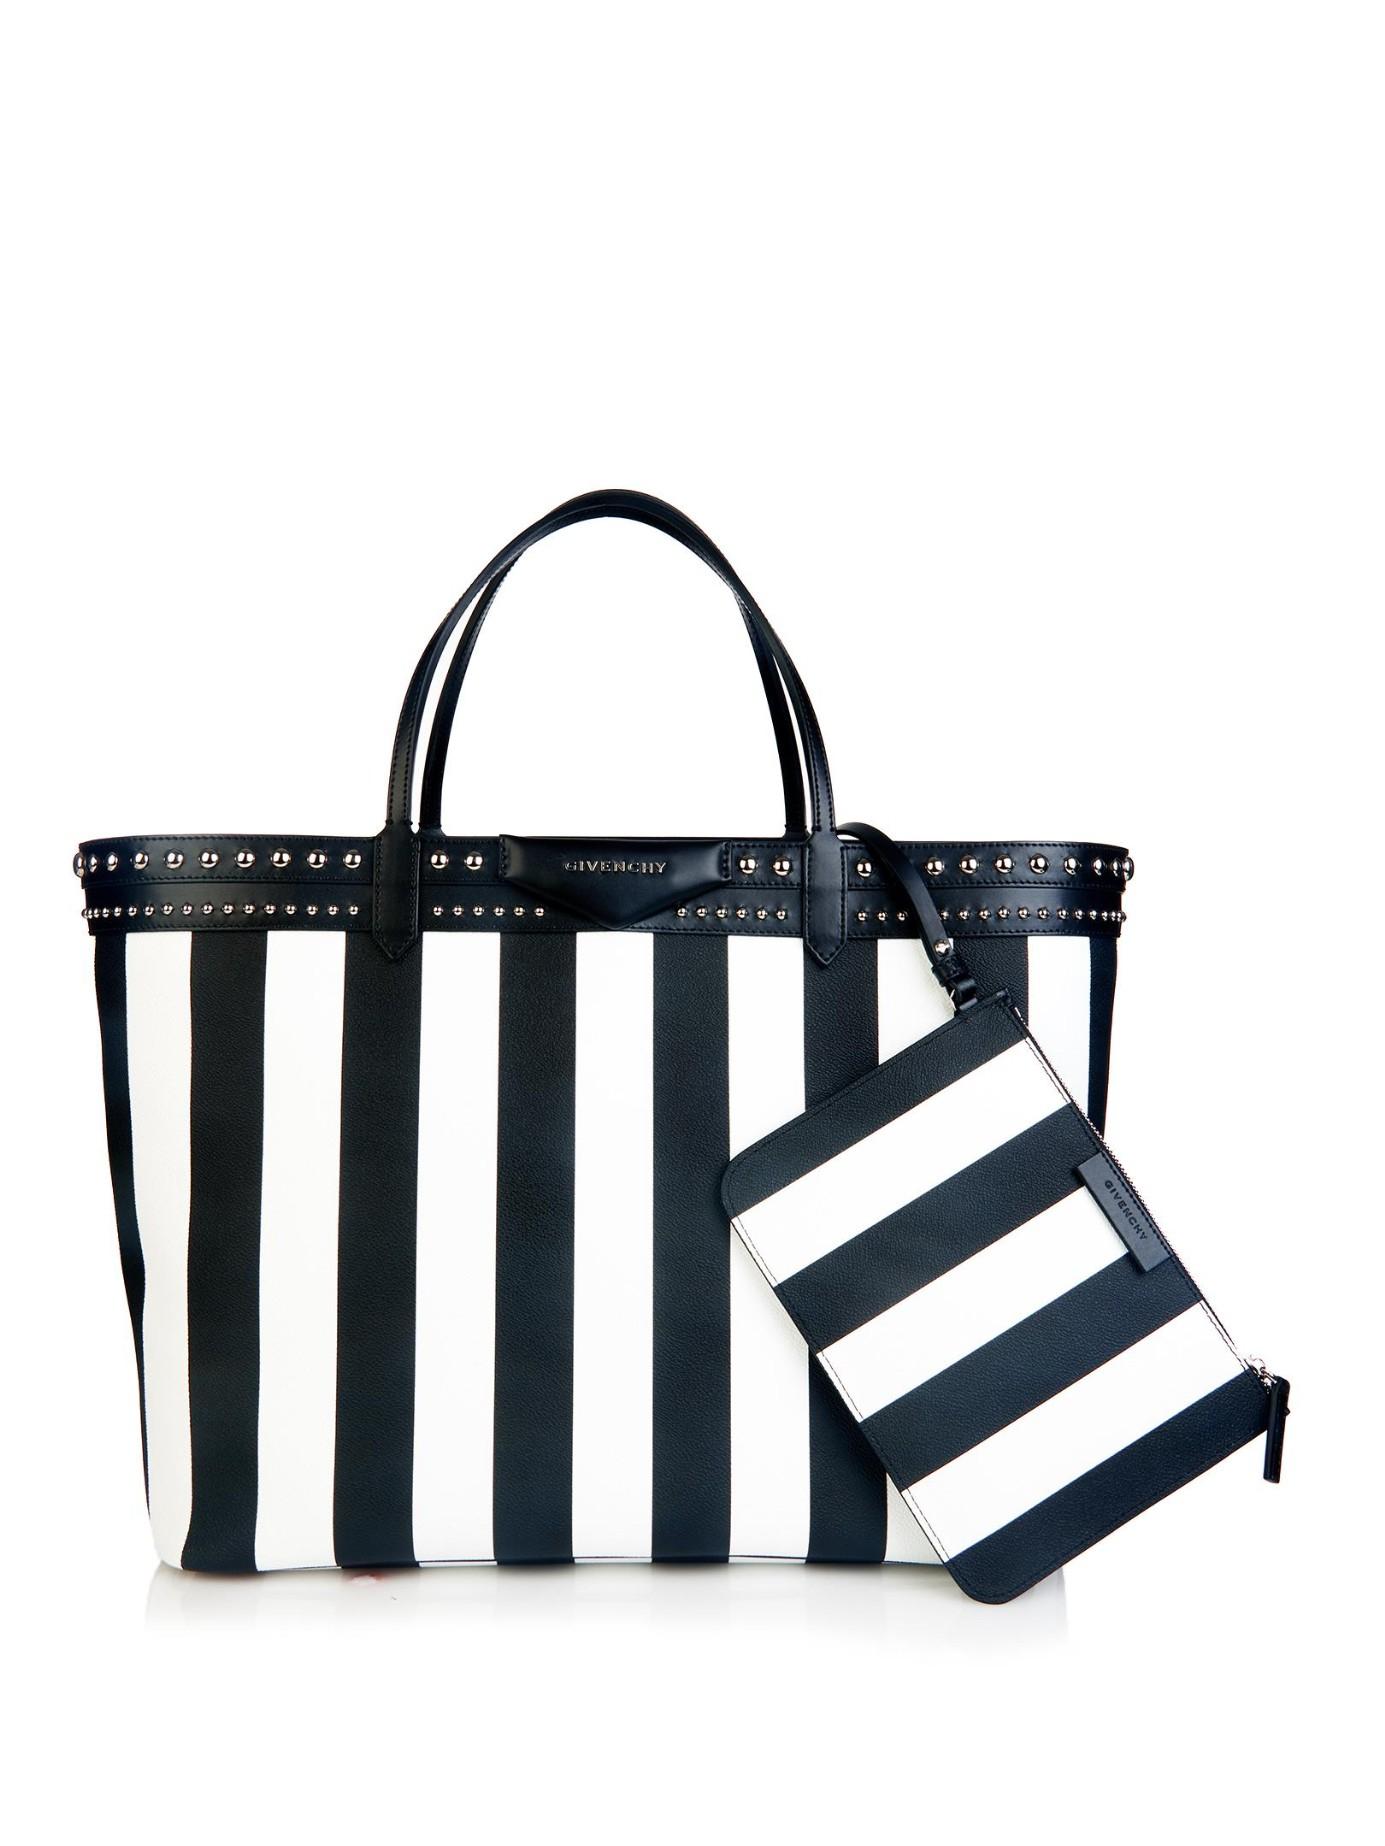 Givenchy Antigona Striped Coated-Canvas Tote in Black